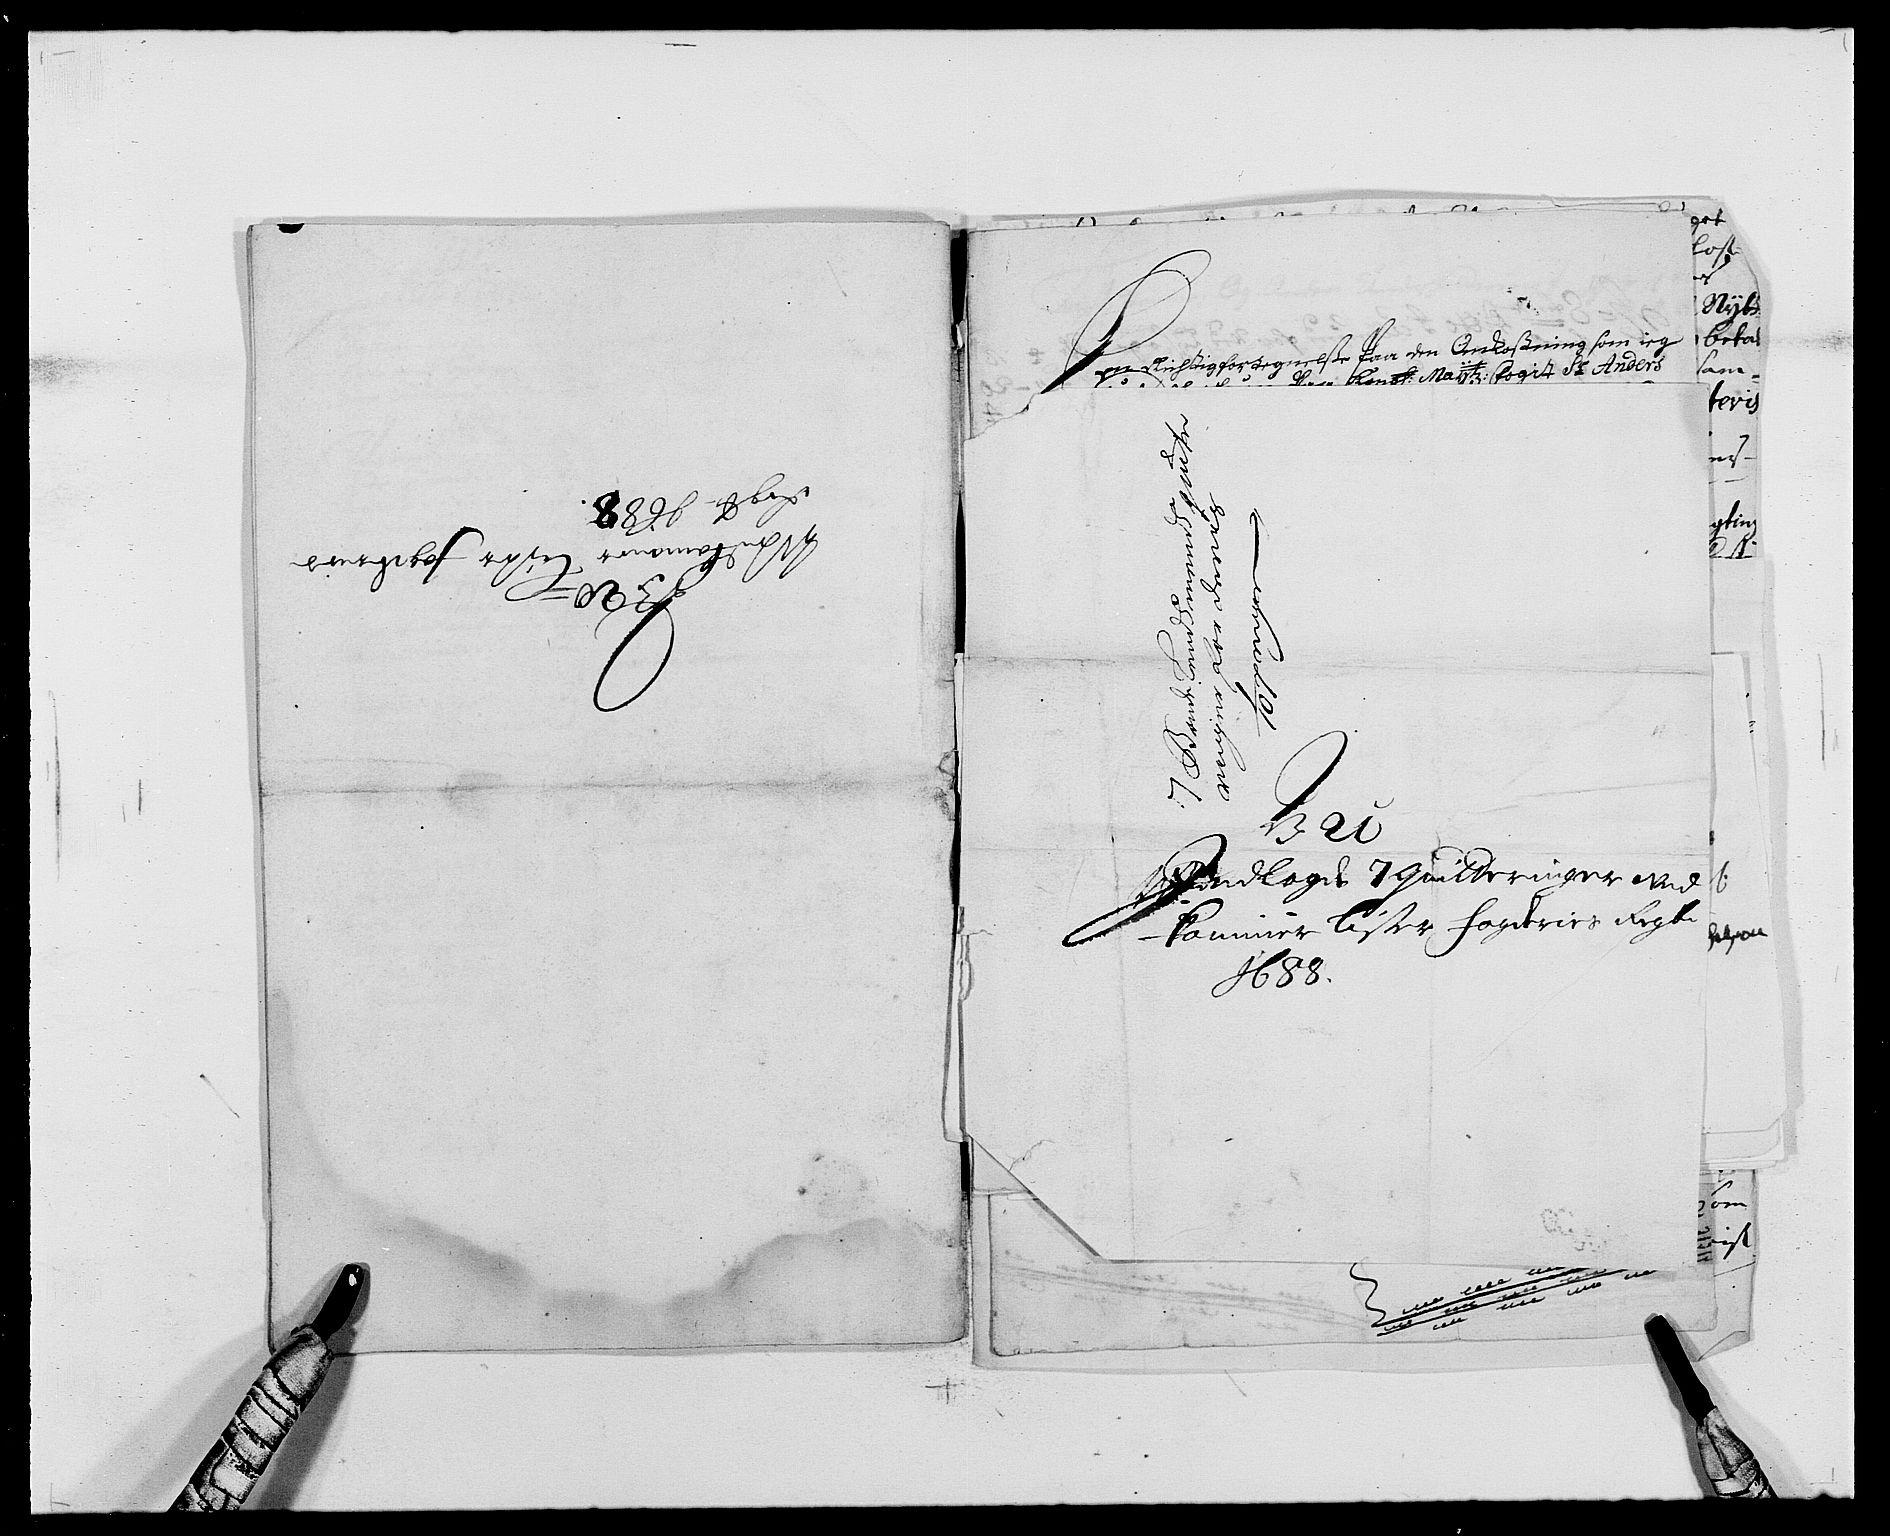 RA, Rentekammeret inntil 1814, Reviderte regnskaper, Fogderegnskap, R41/L2535: Fogderegnskap Lista, 1686-1689, s. 101